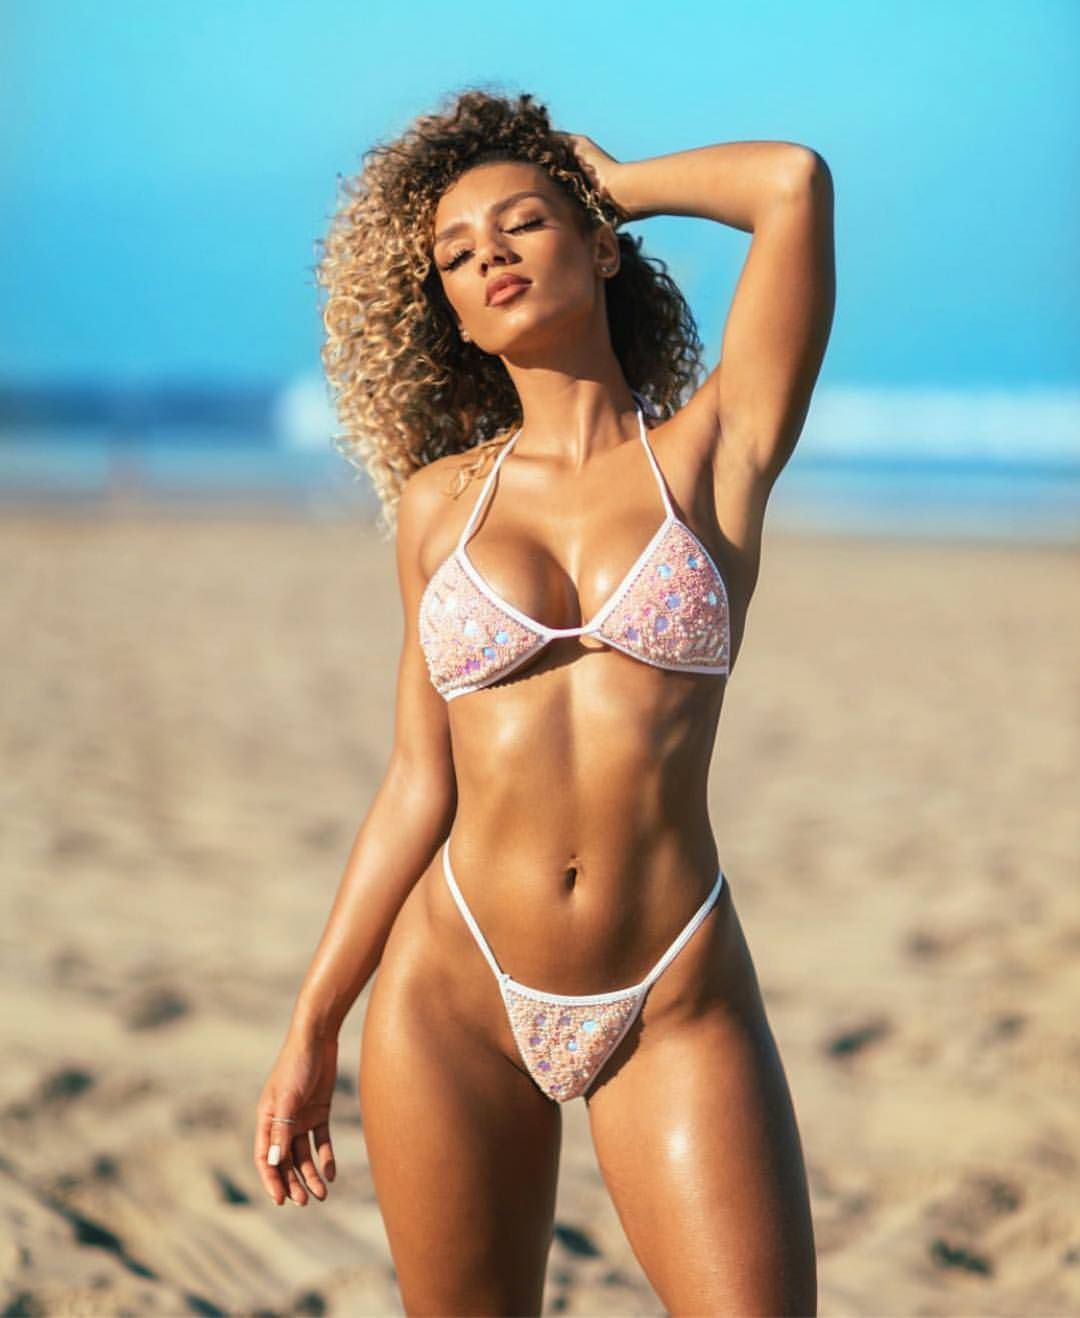 Bikini Alana Marie nudes (42 foto and video), Pussy, Cleavage, Selfie, butt 2018